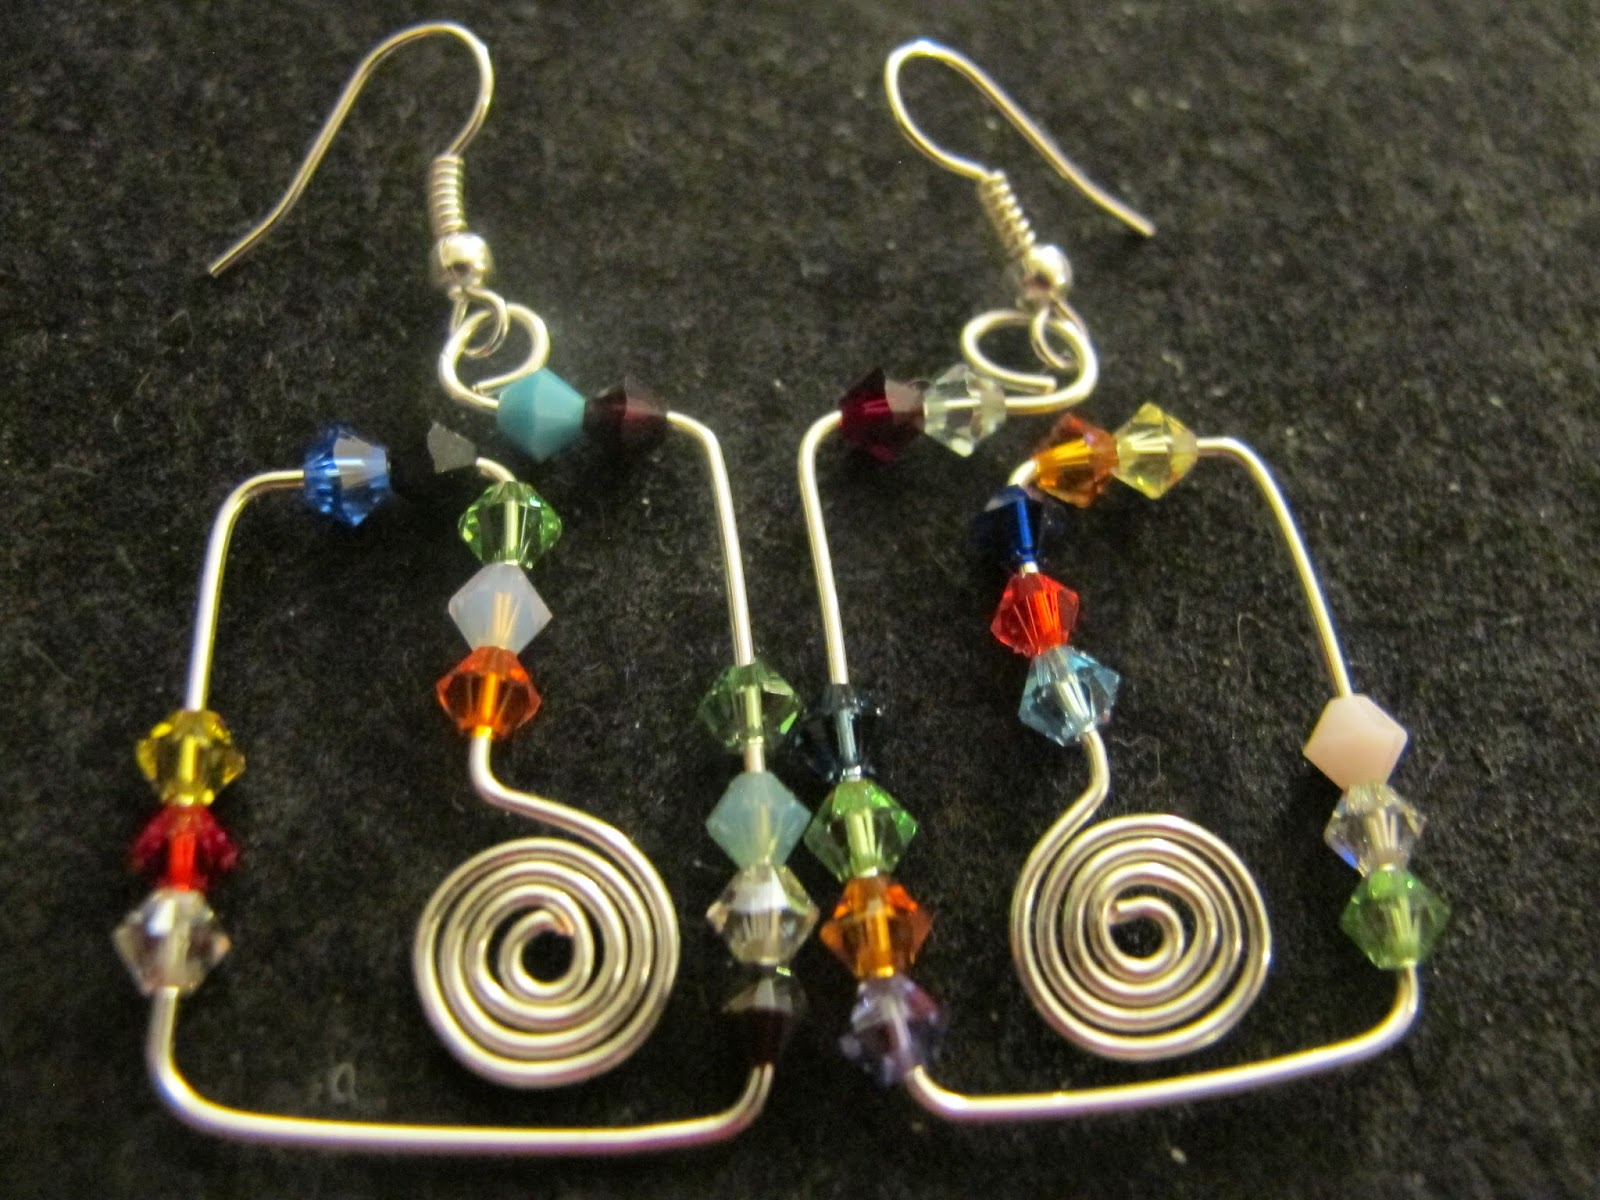 Naomi S Designs Handmade Wire Jewelry Funky Silver Wire